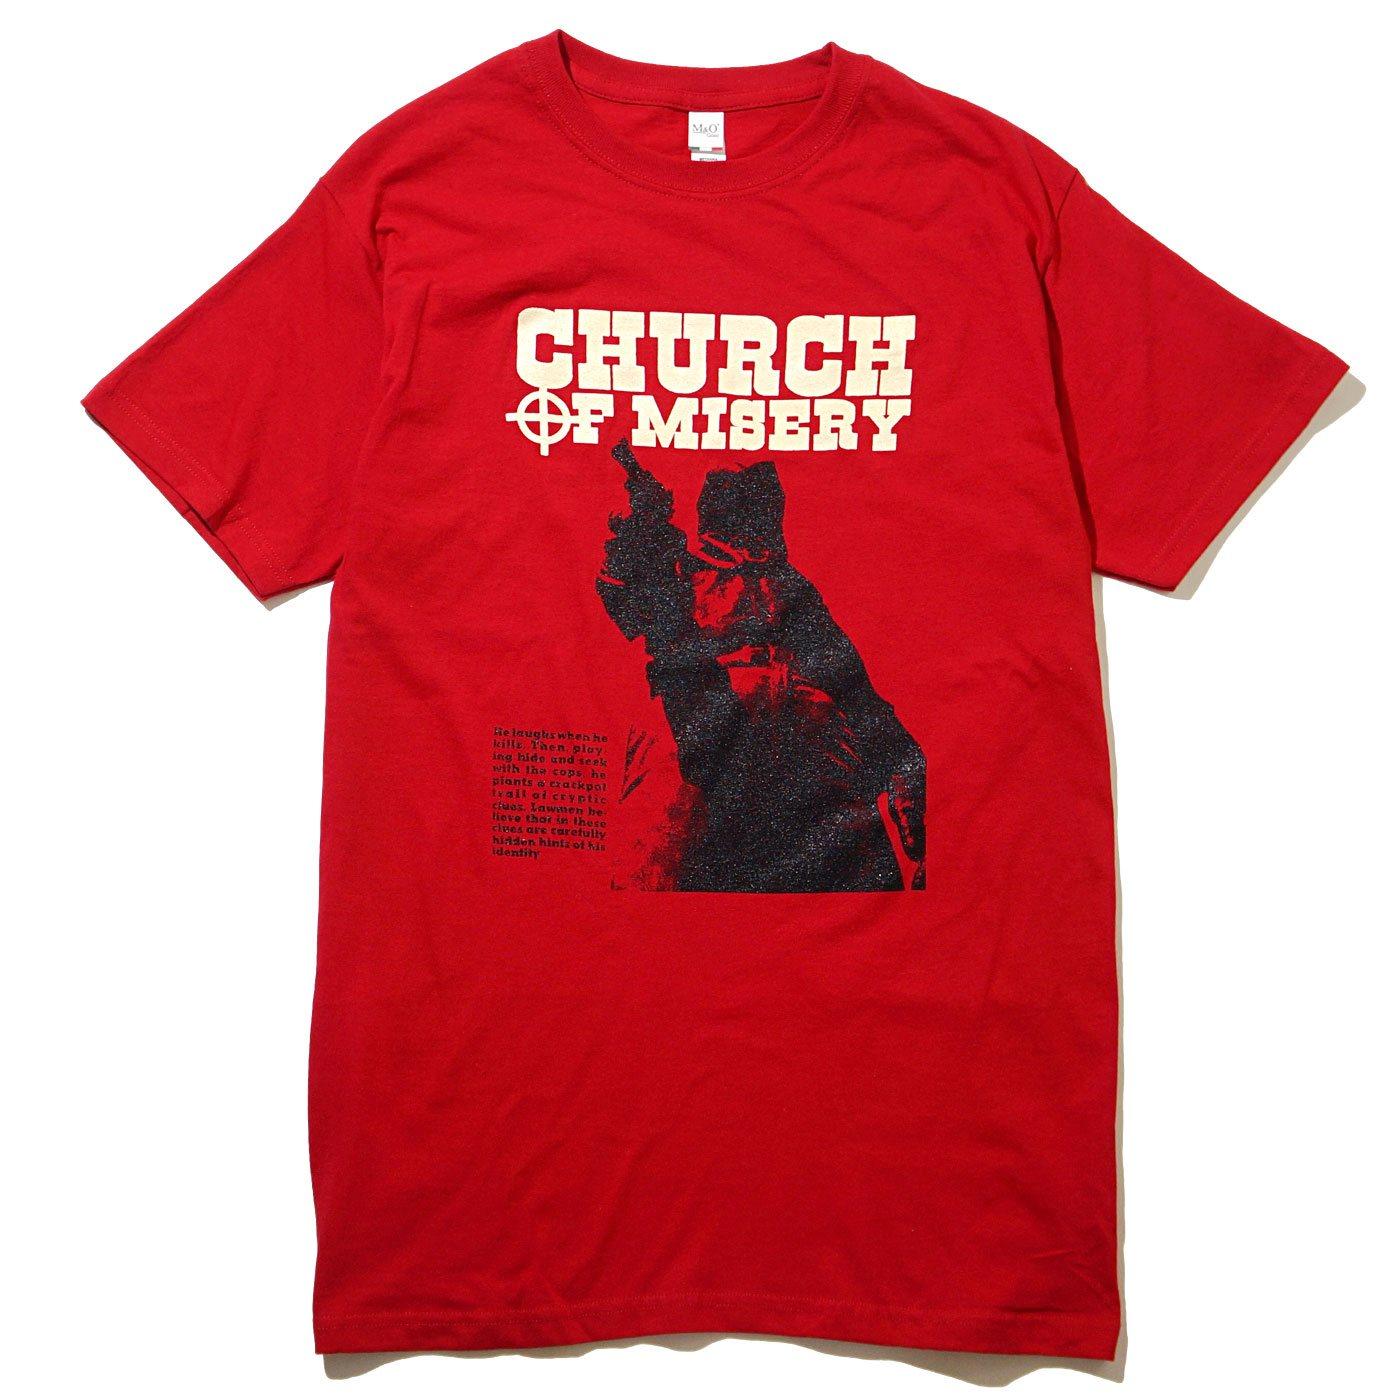 CHURCH OF MISERY Tシャツ ZODIAC-Red